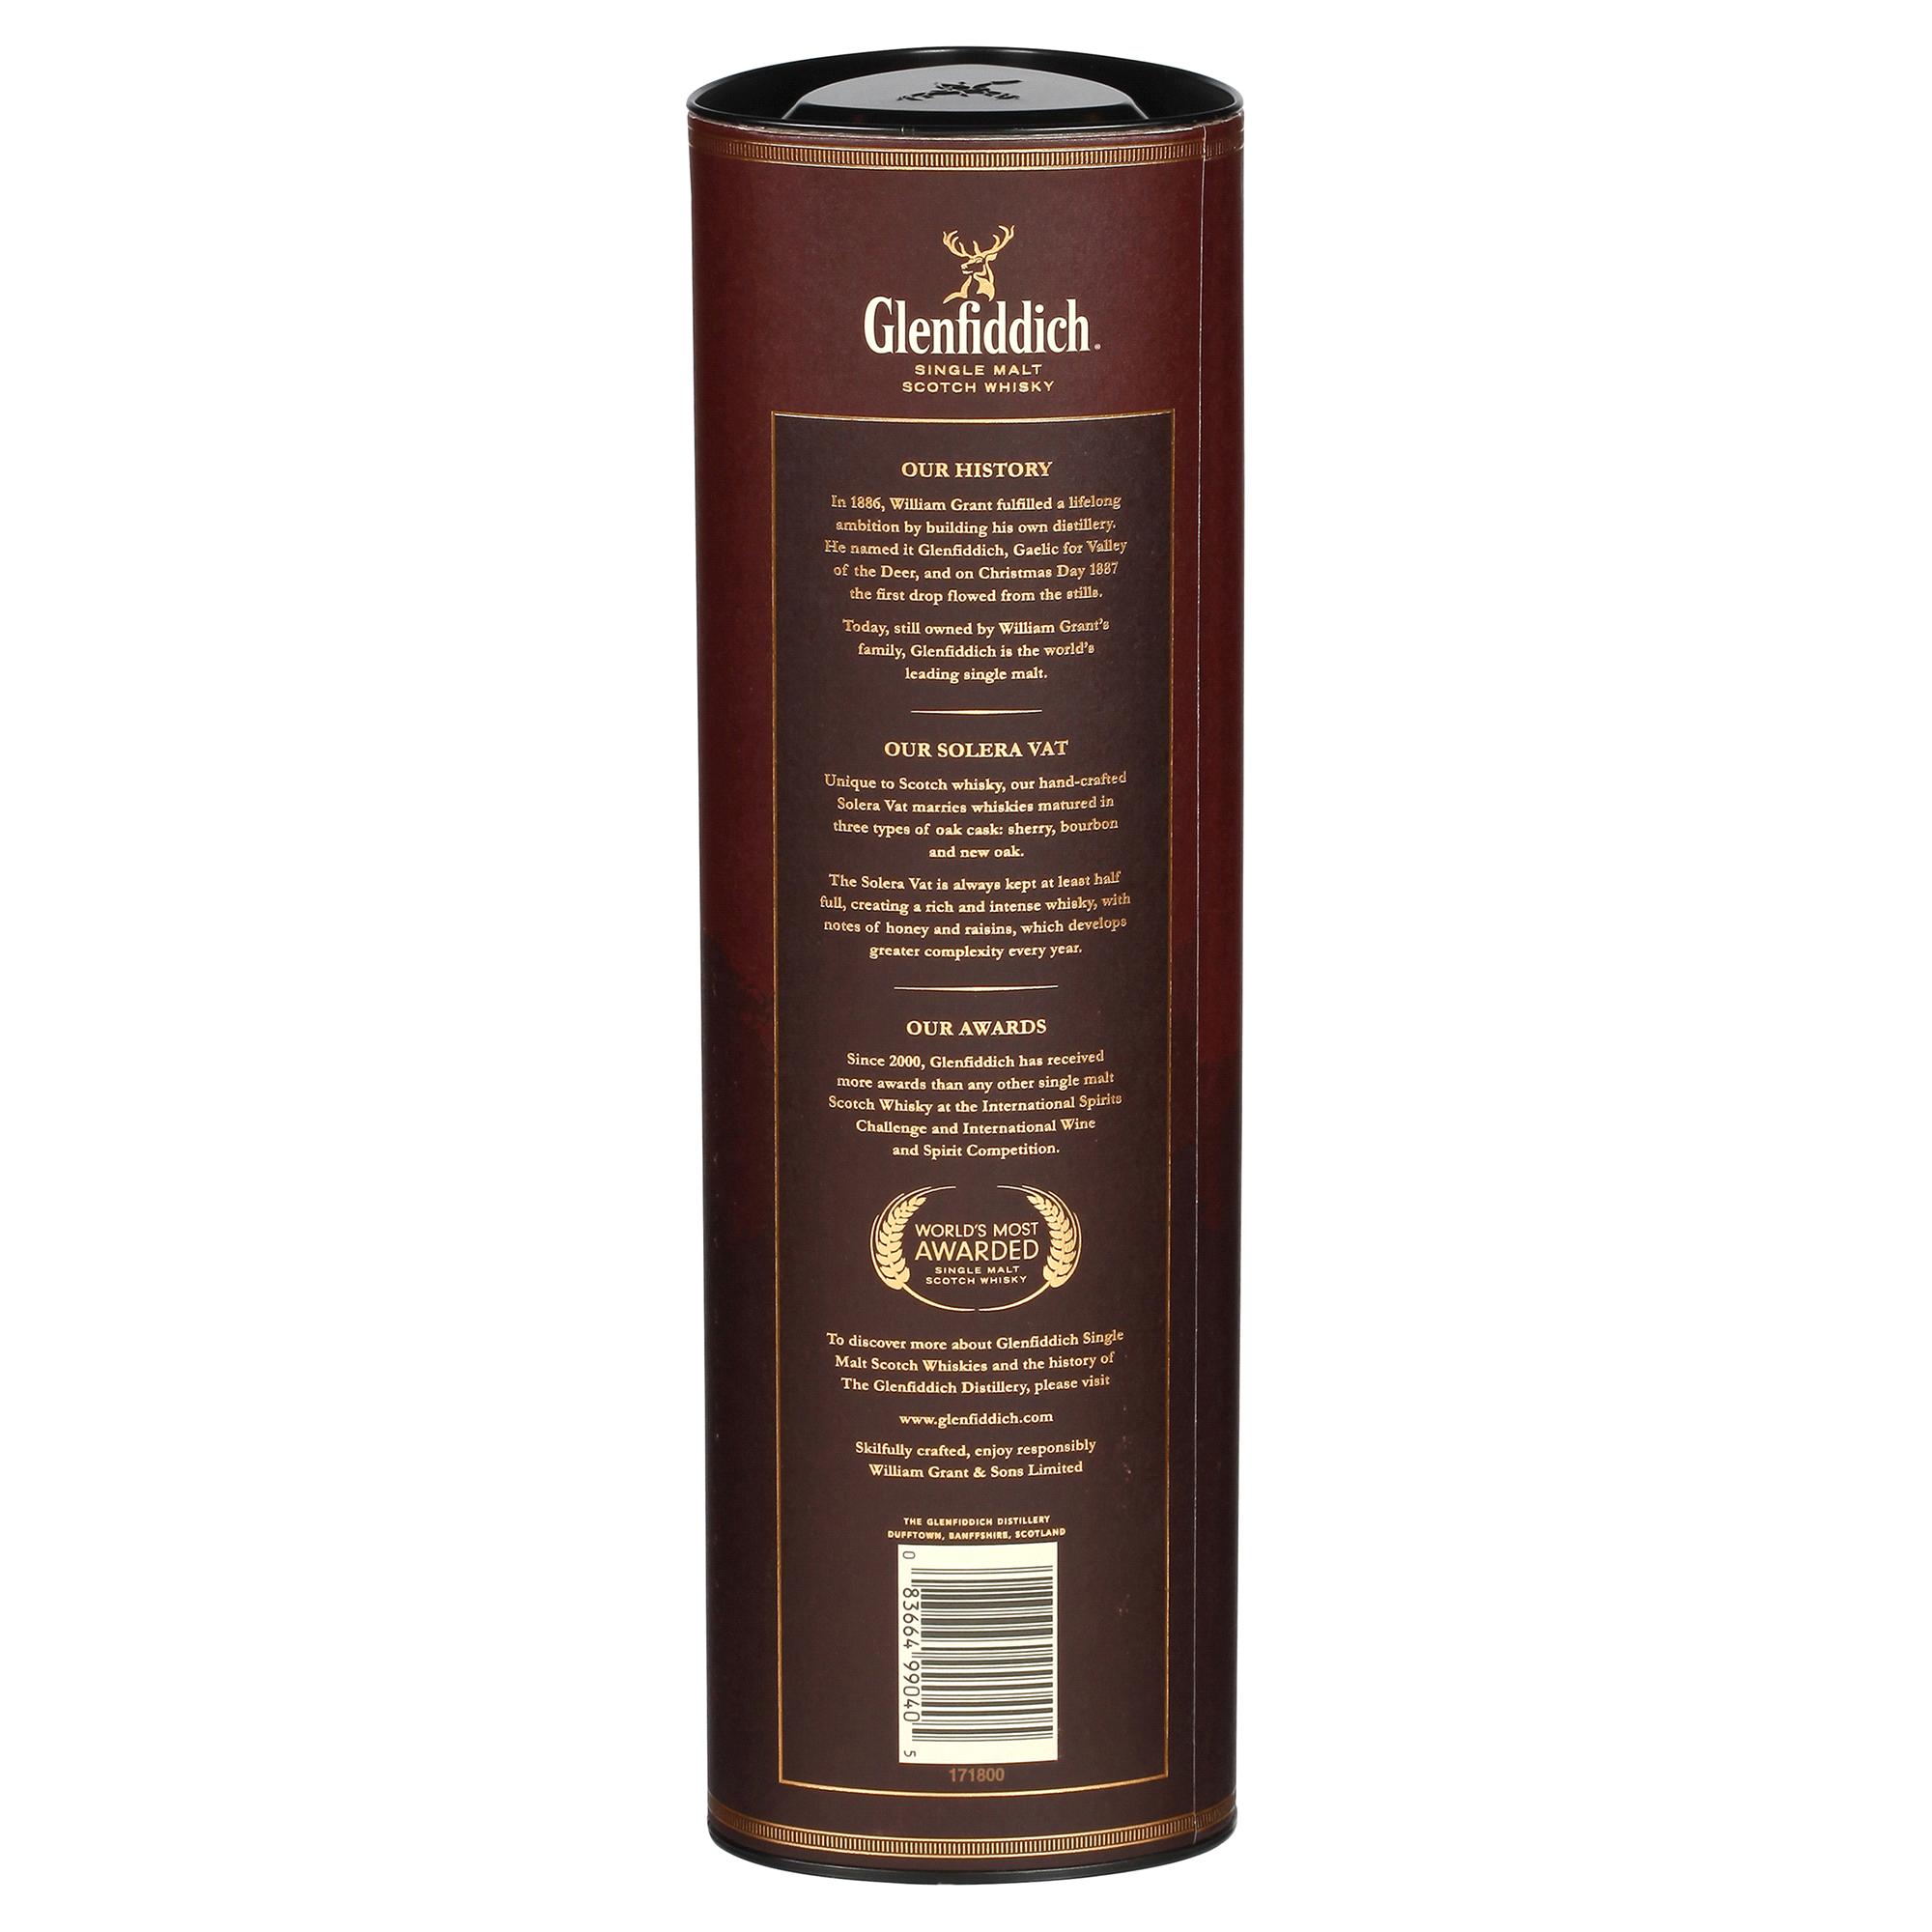 Glenfiddich Solera Single Malt Scotch Whisky 750 mL   Meijer.com